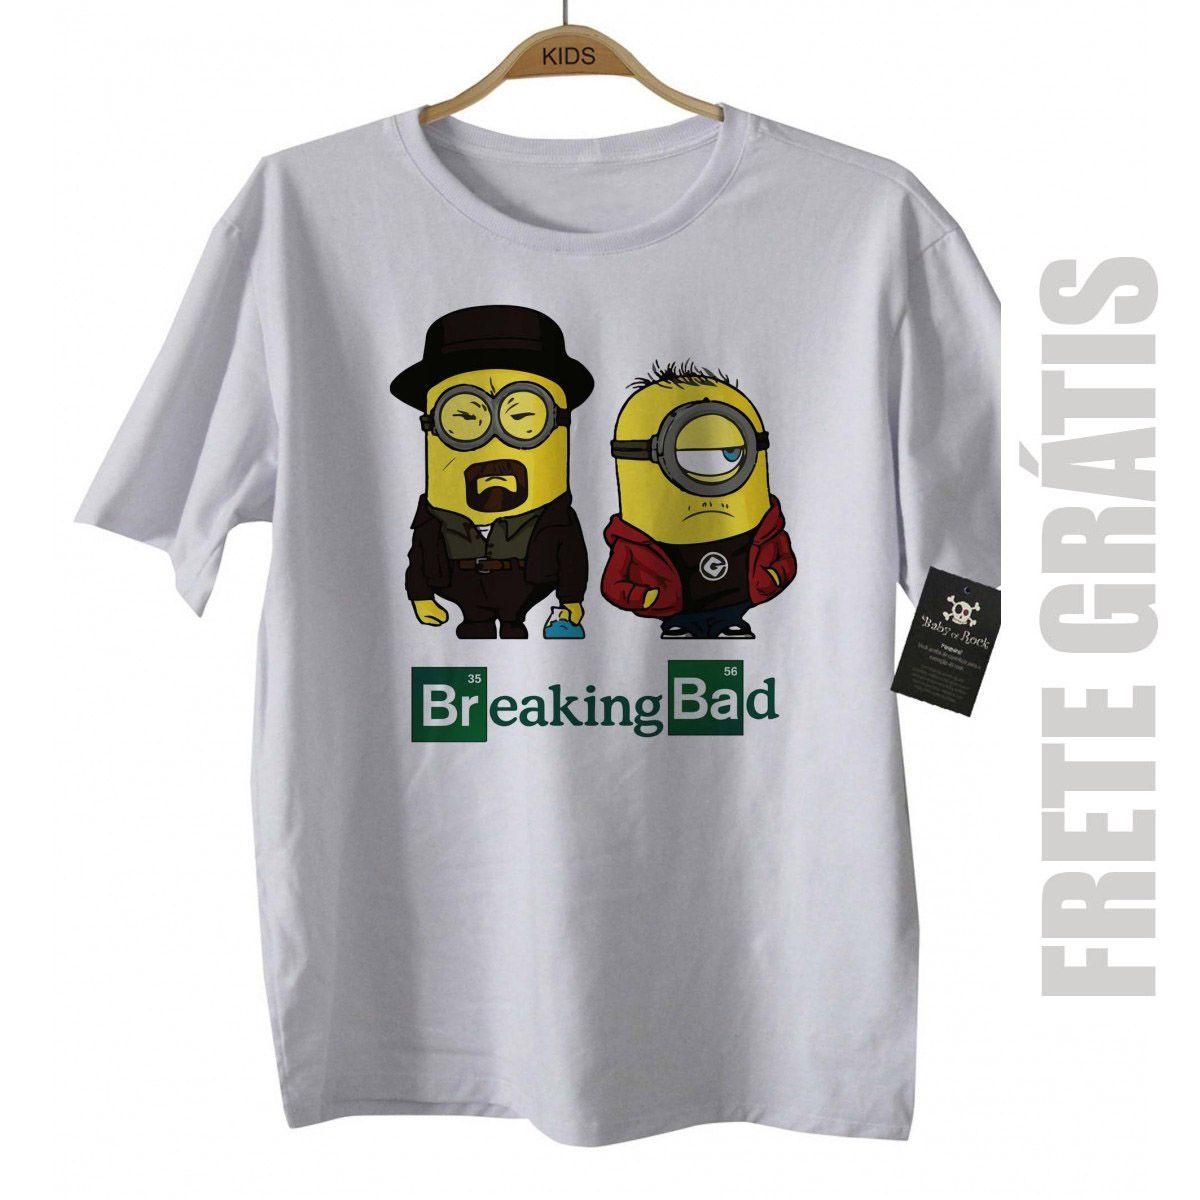 Camiseta de Série Infantil - Breaking Bad - Minions - White  - Baby Monster S/A